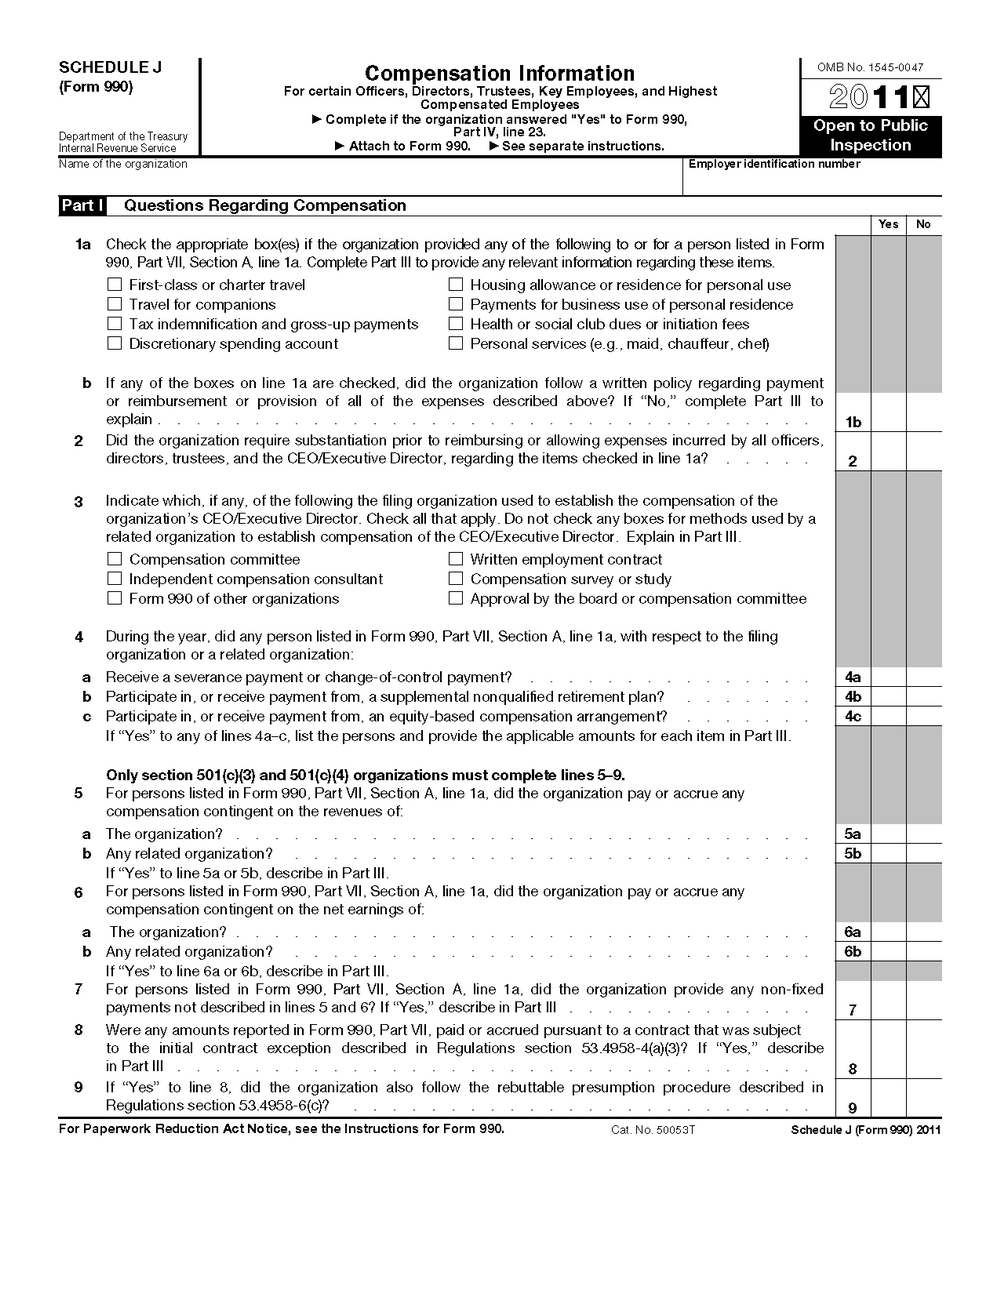 Irs Form 1040ez Online Filing